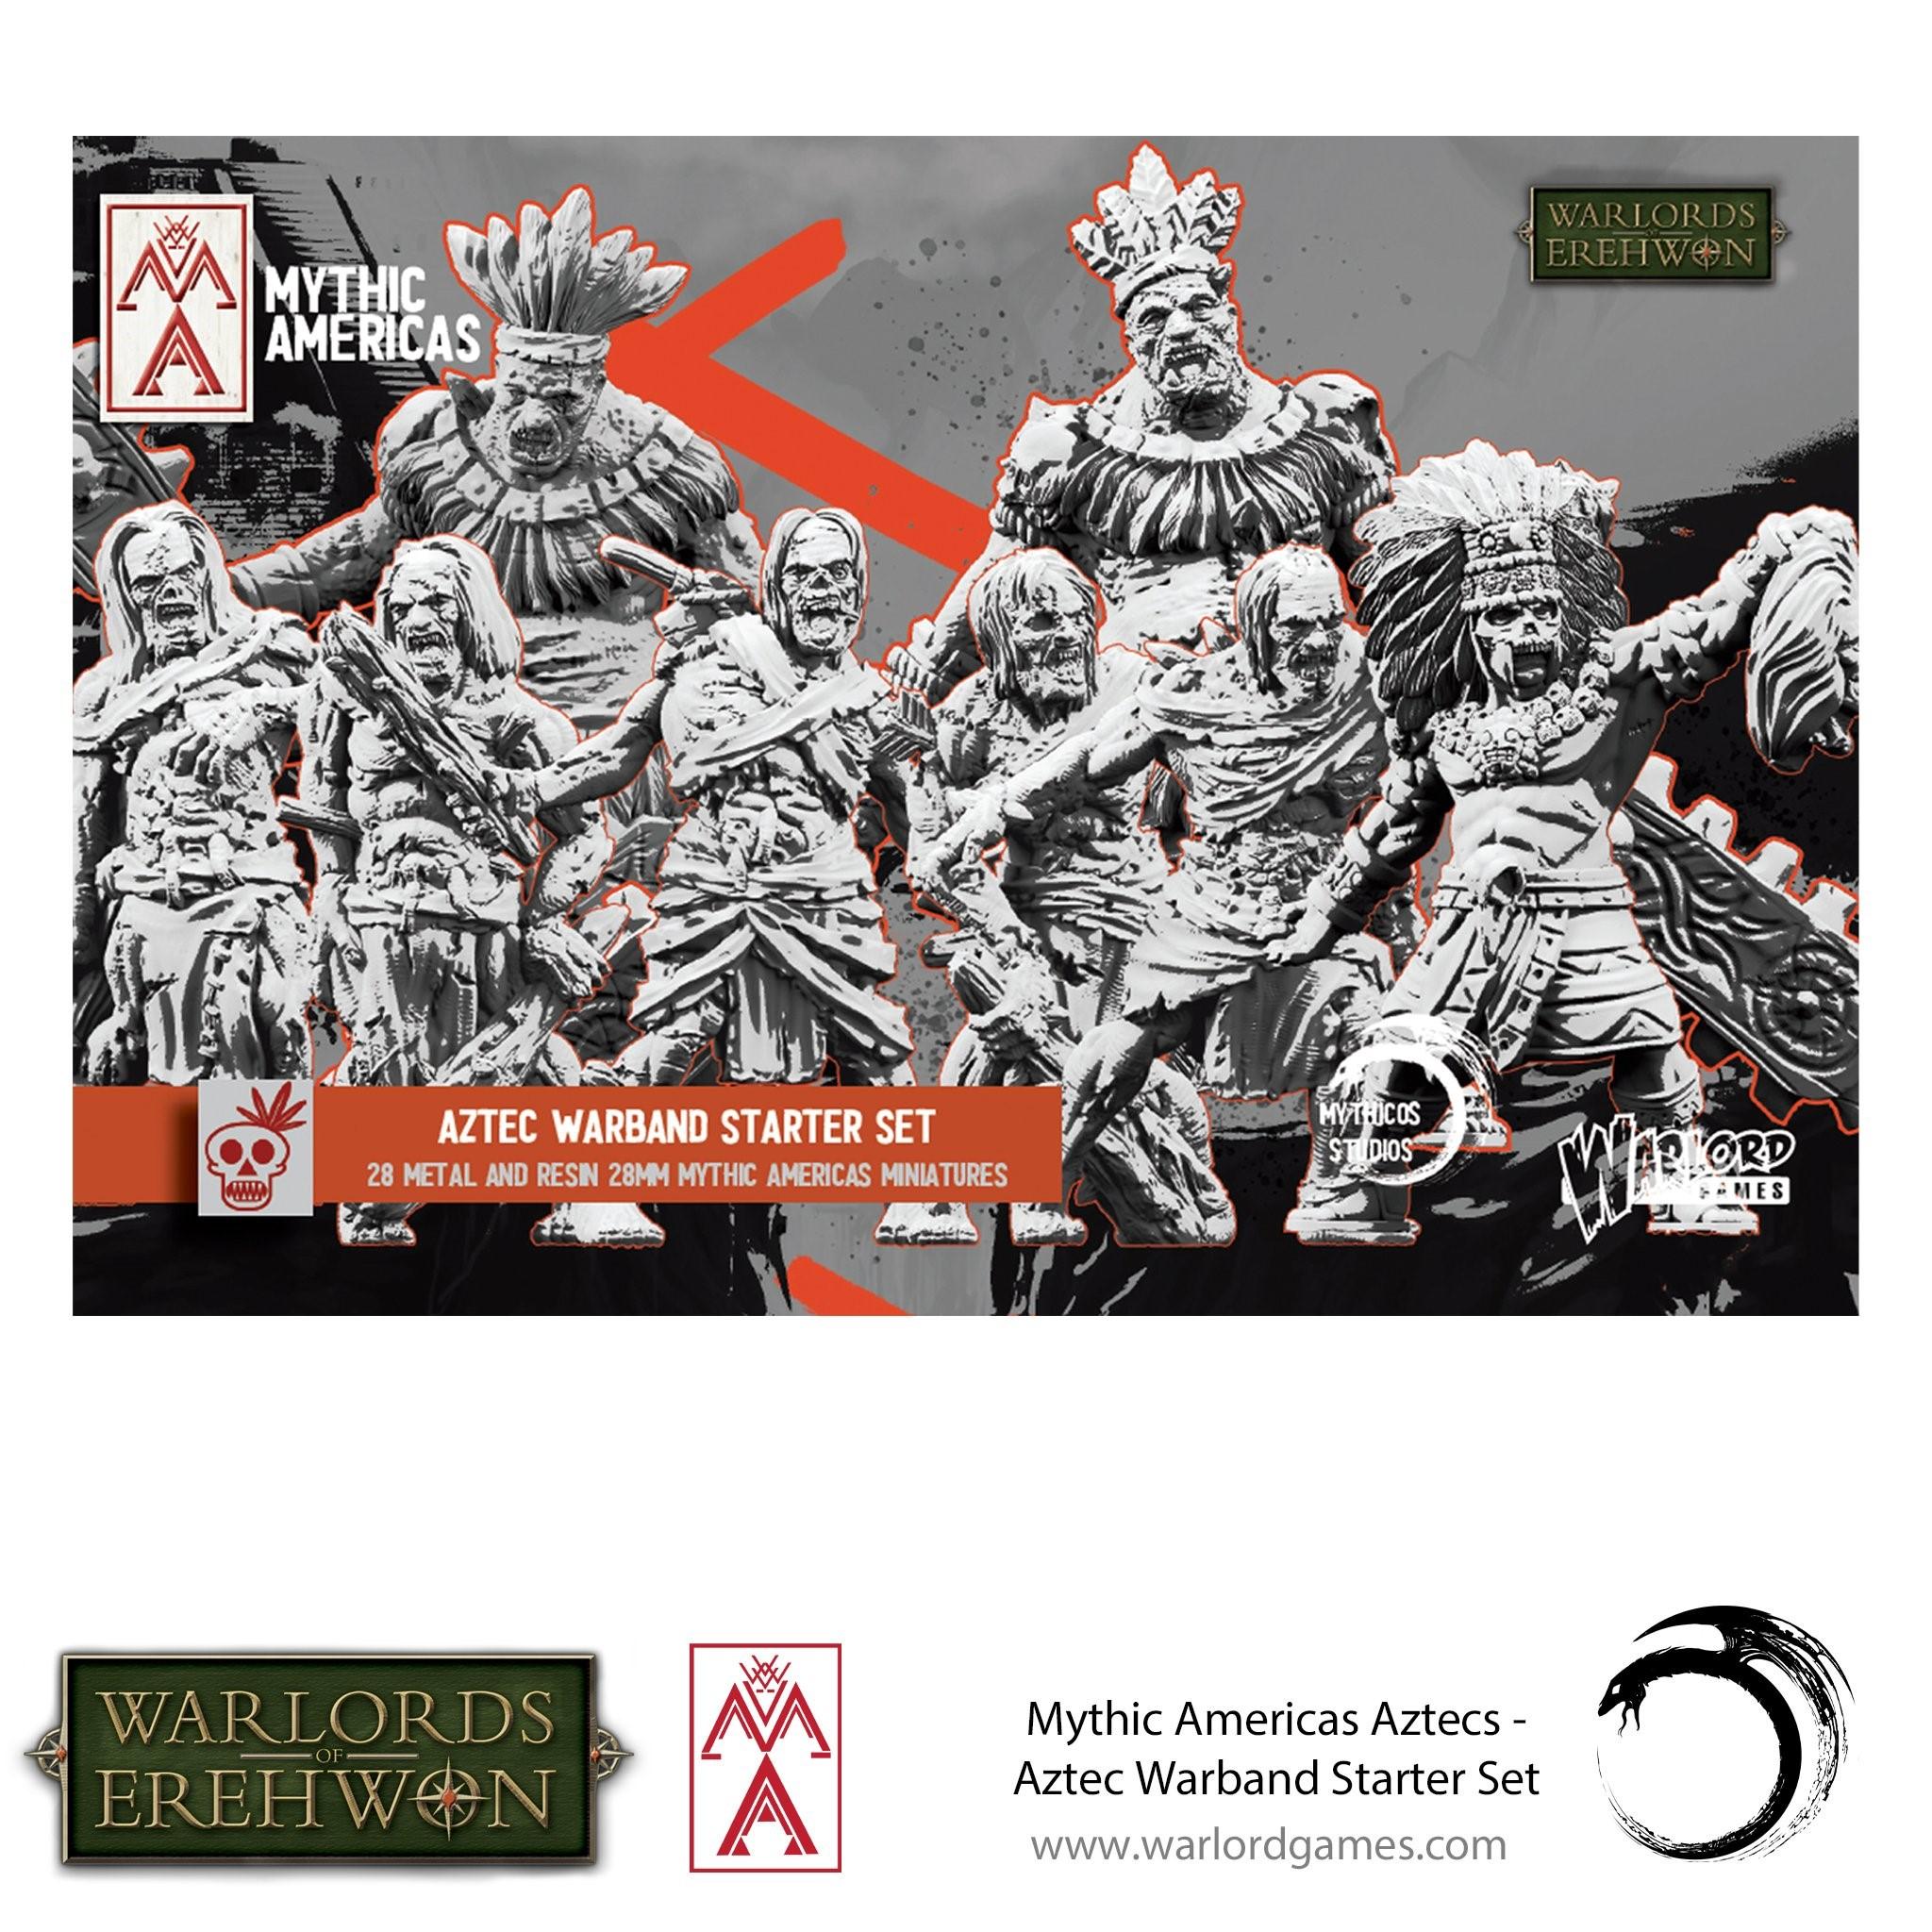 Mythic Americas Aztec Warband Starter Set